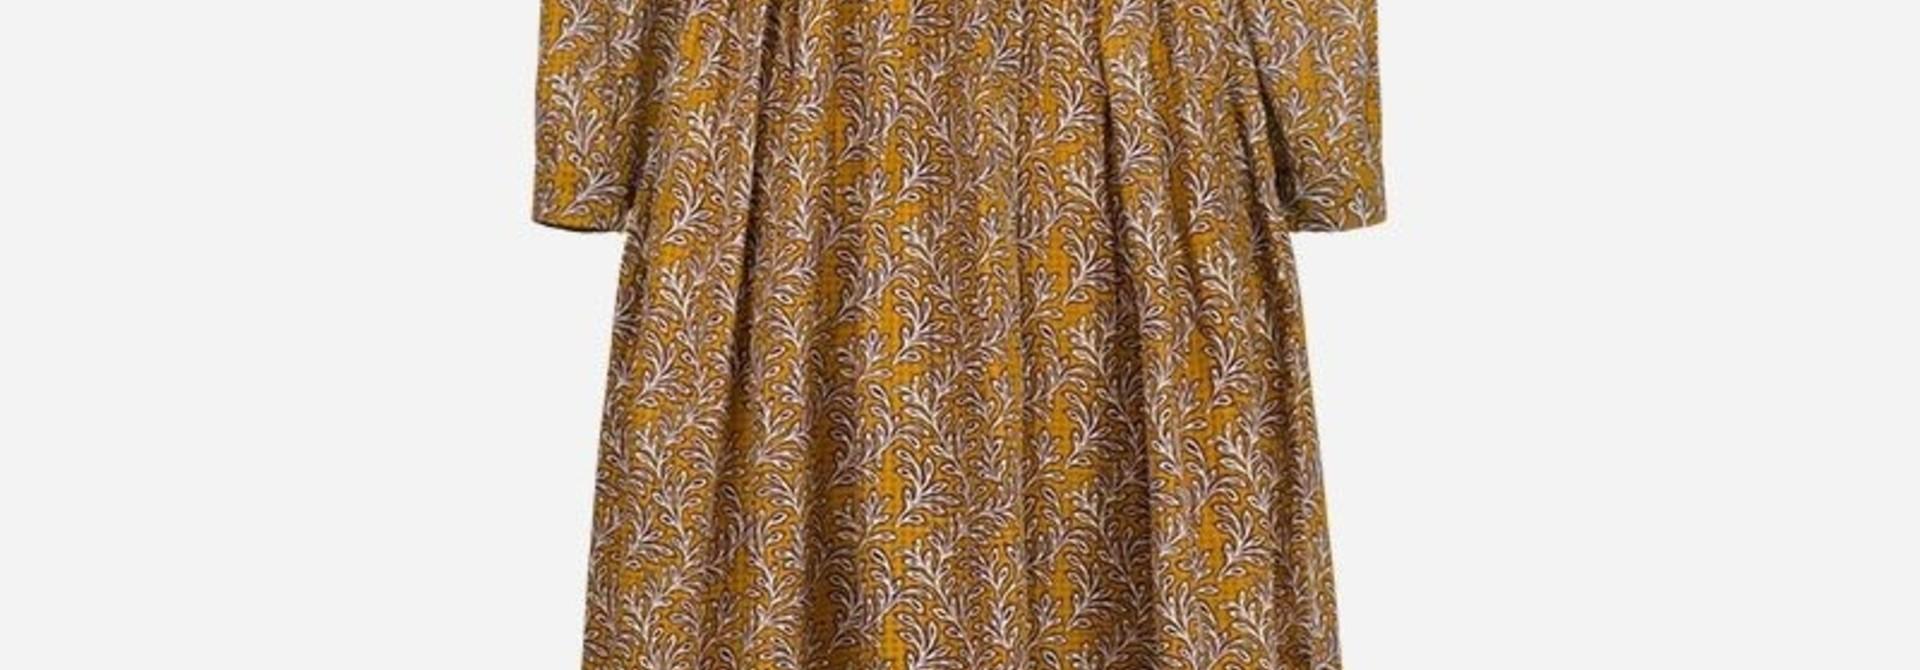 Magnolia jurk vanessa Bruno